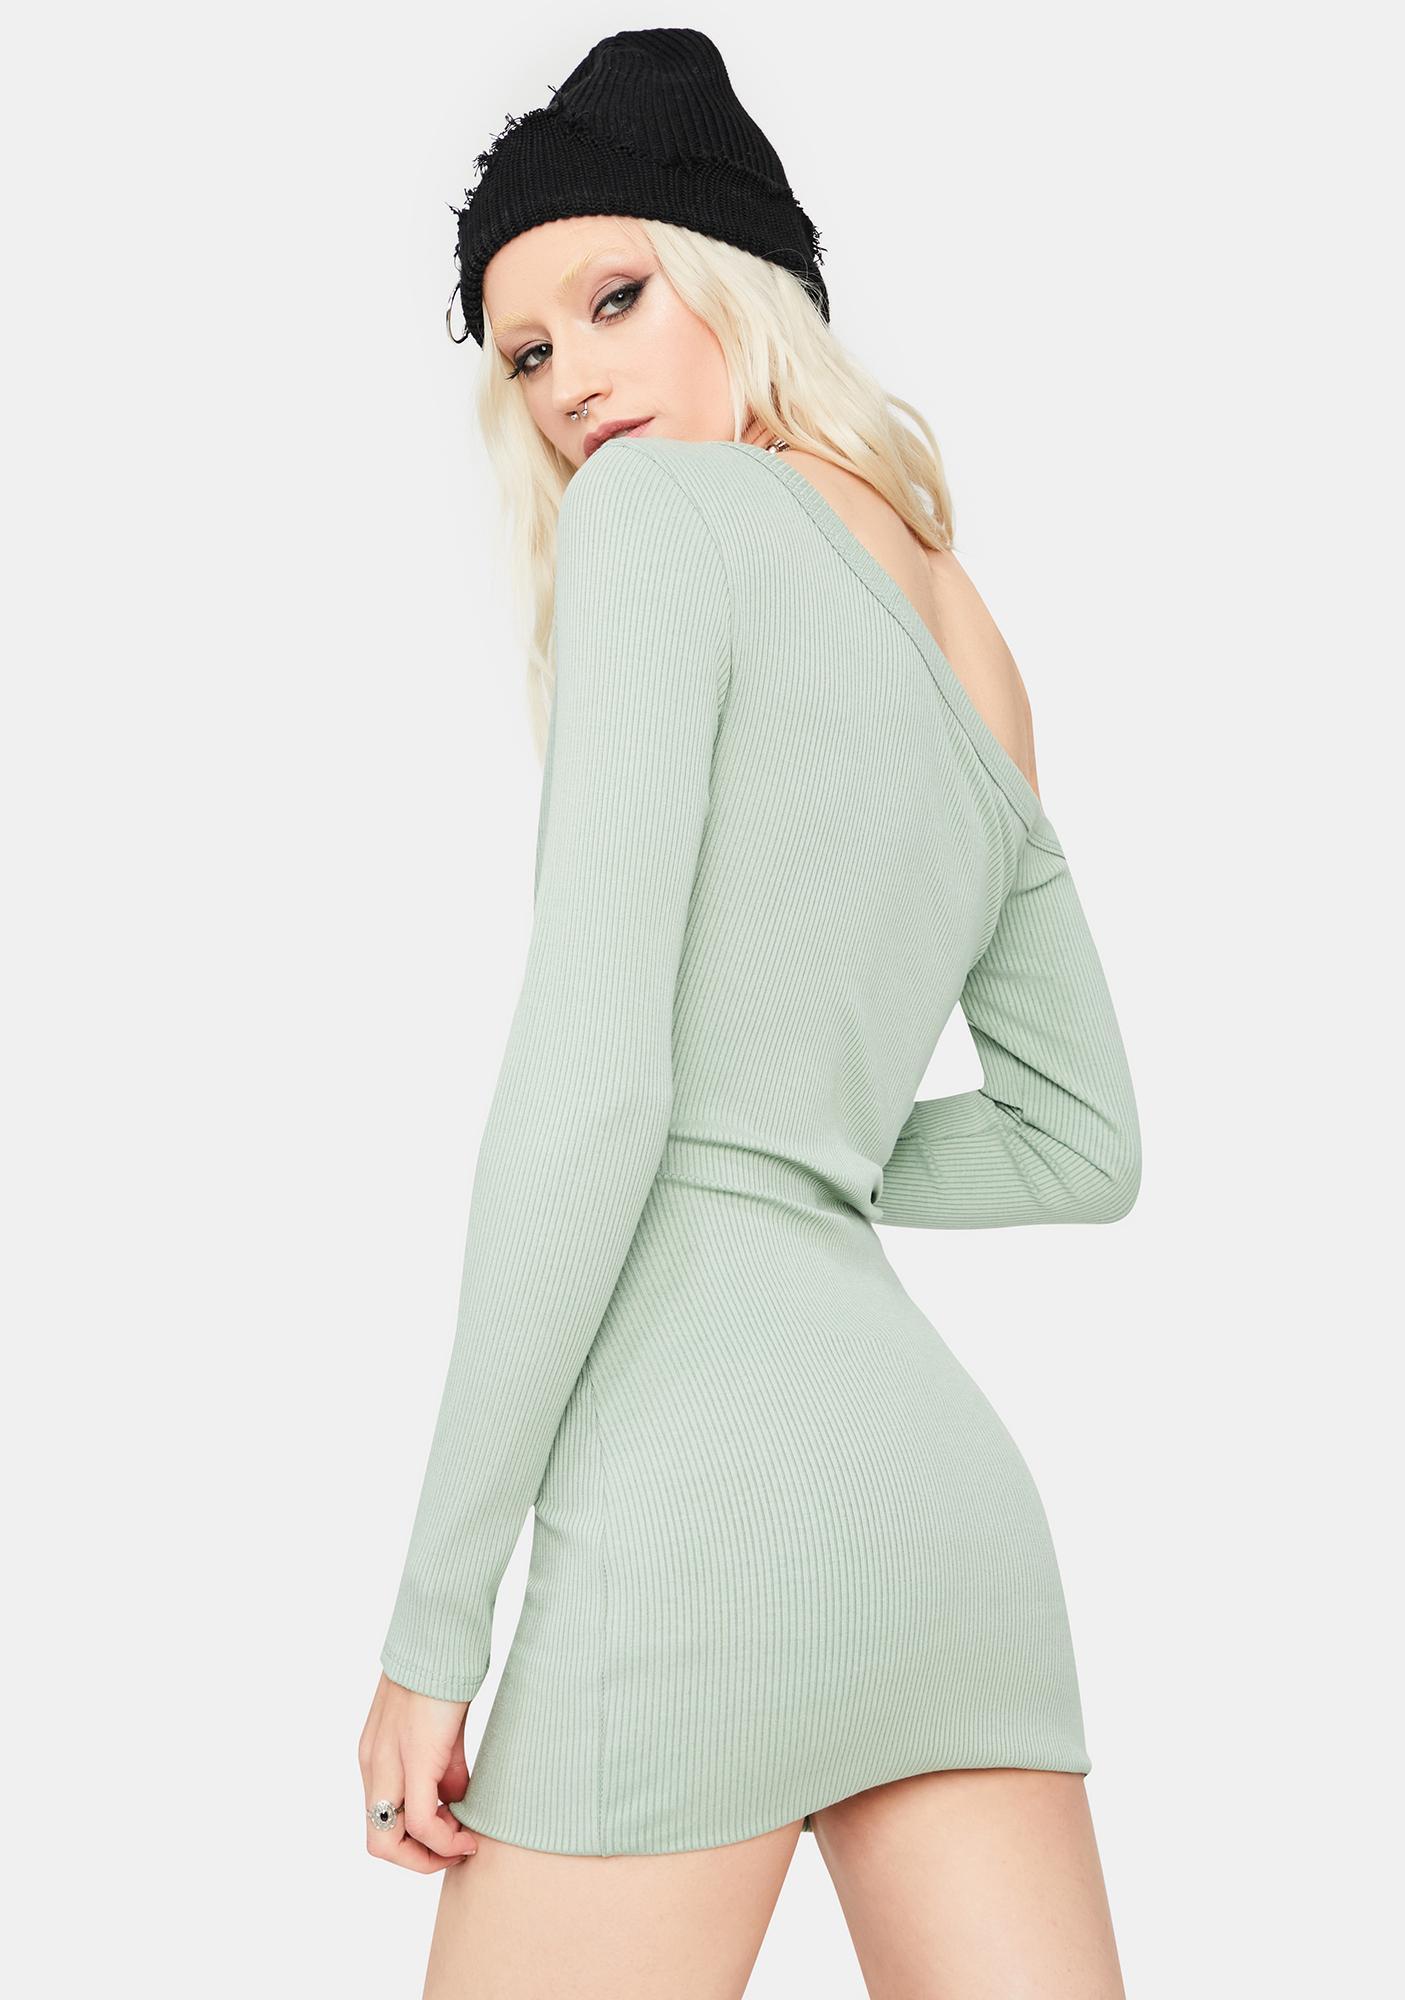 Mint Alert 'N Ready Off The Shoulder Mini Dress